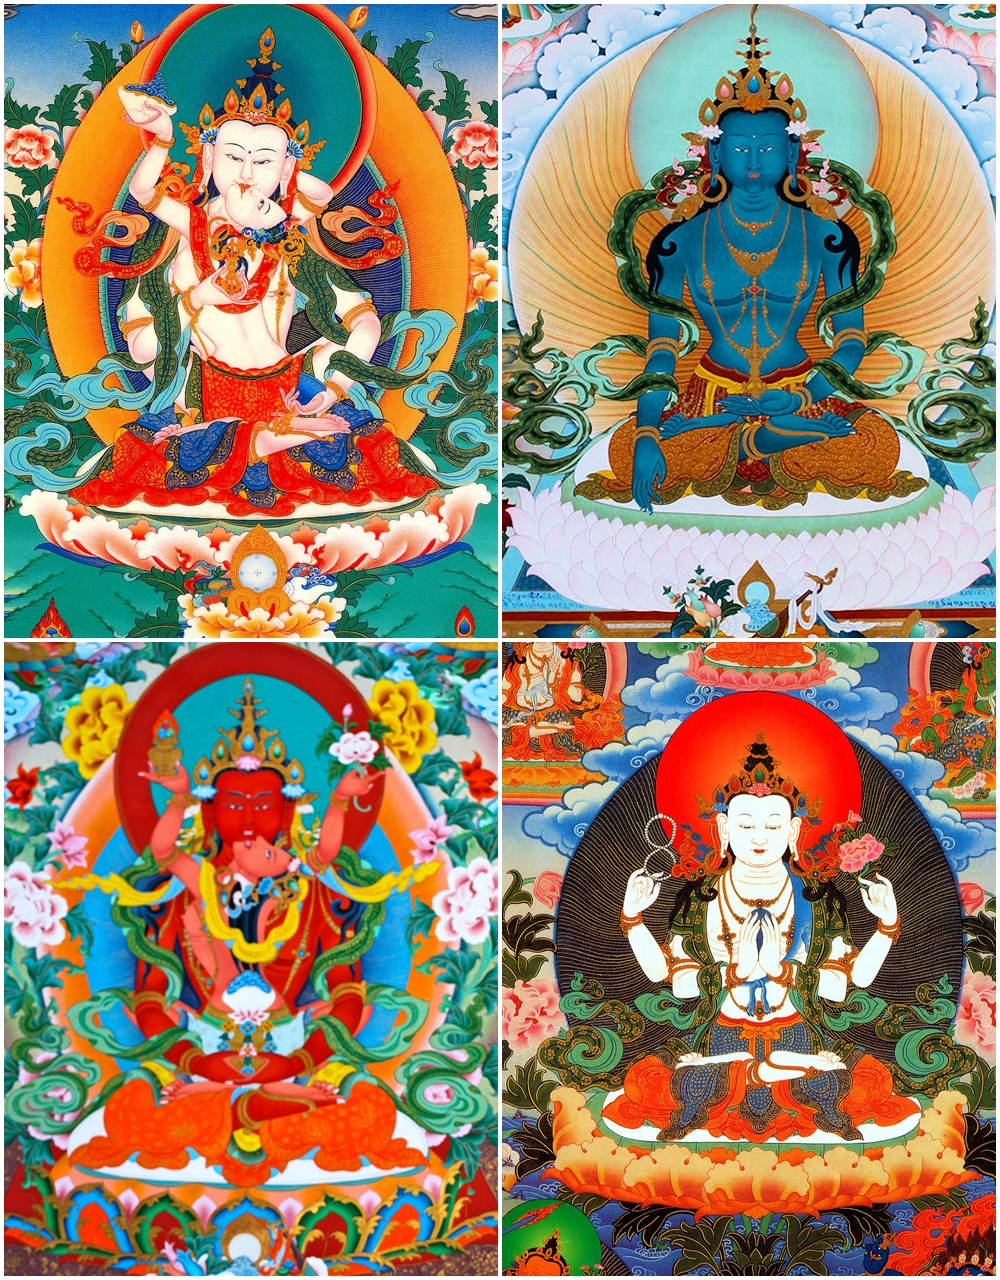 The Four Essential Deities of Drukpa Kargyu (Tib: དཔལ་འབྲུག་པའི་འཕྲལ་དགོས་ཆོས་བཞི་ནི། )